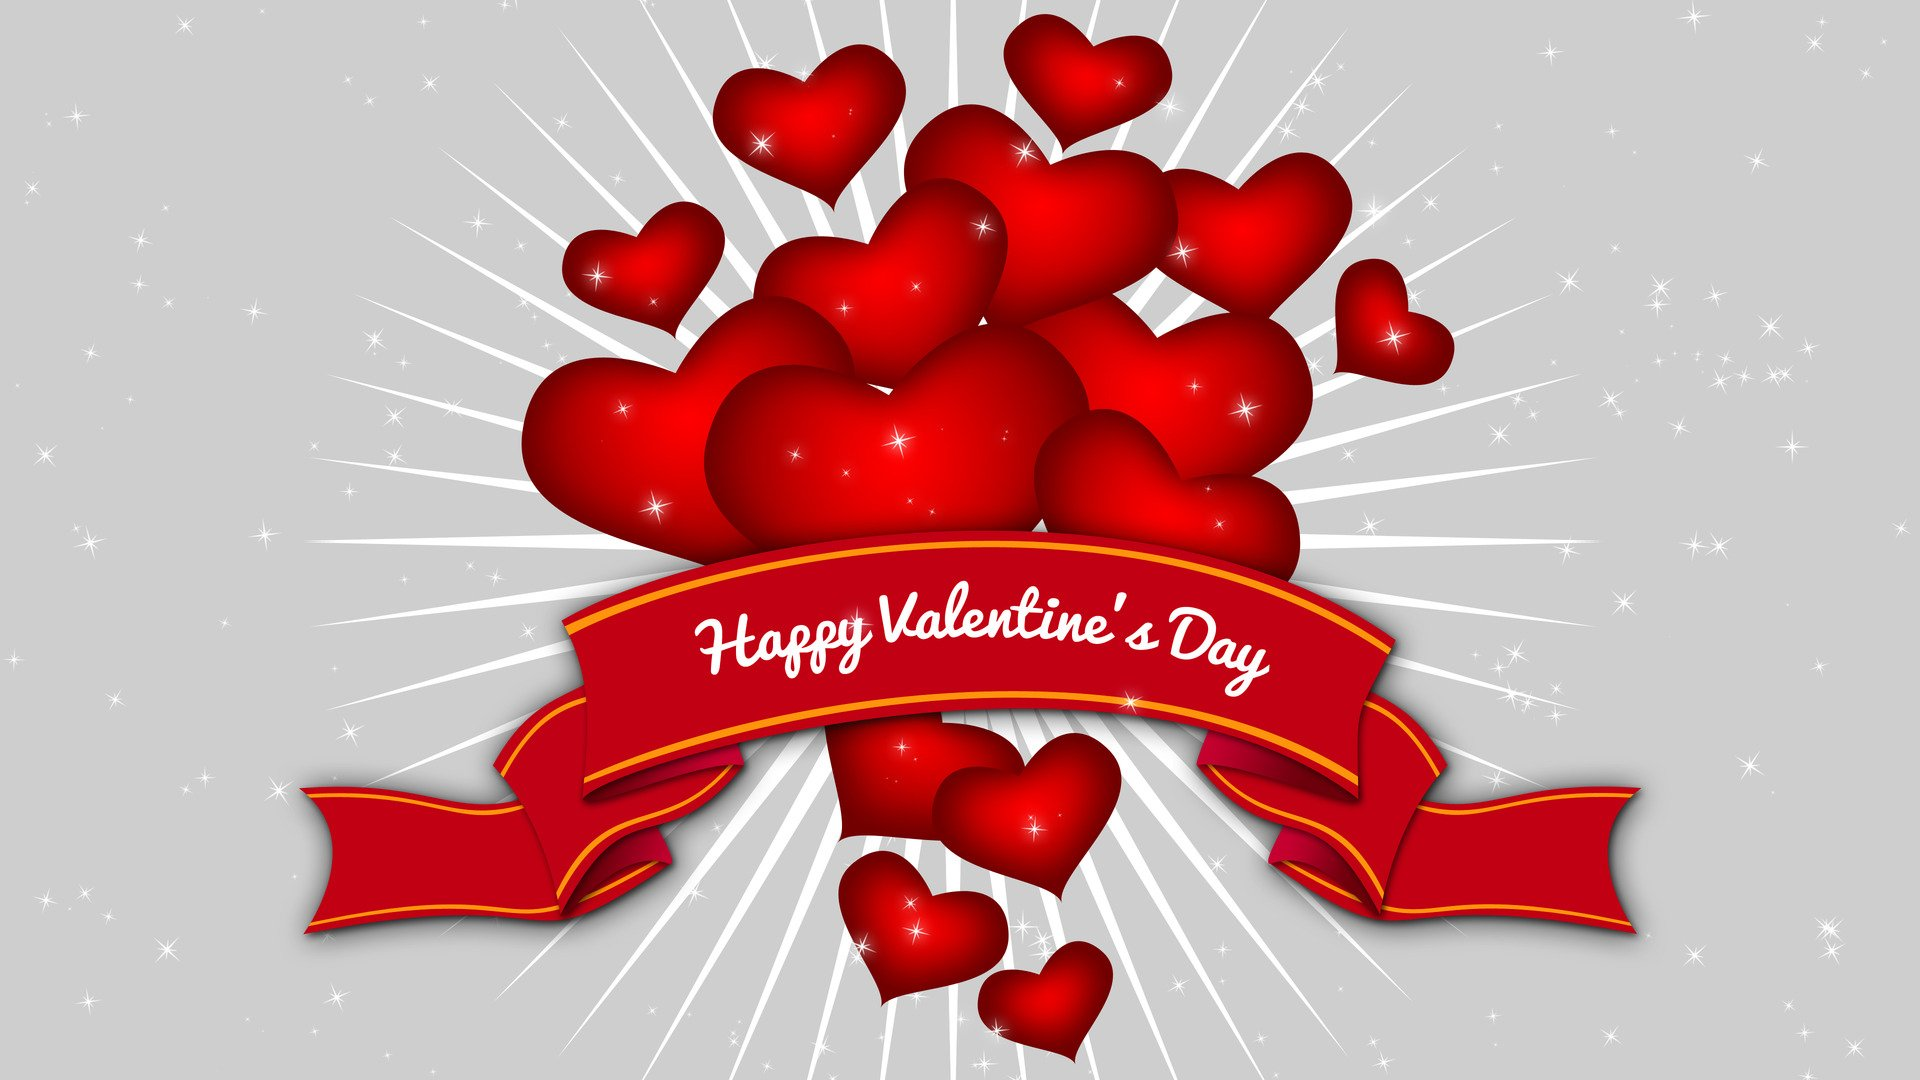 节日 - 情人节  节日 心形 Happy Valentine's Day 壁纸